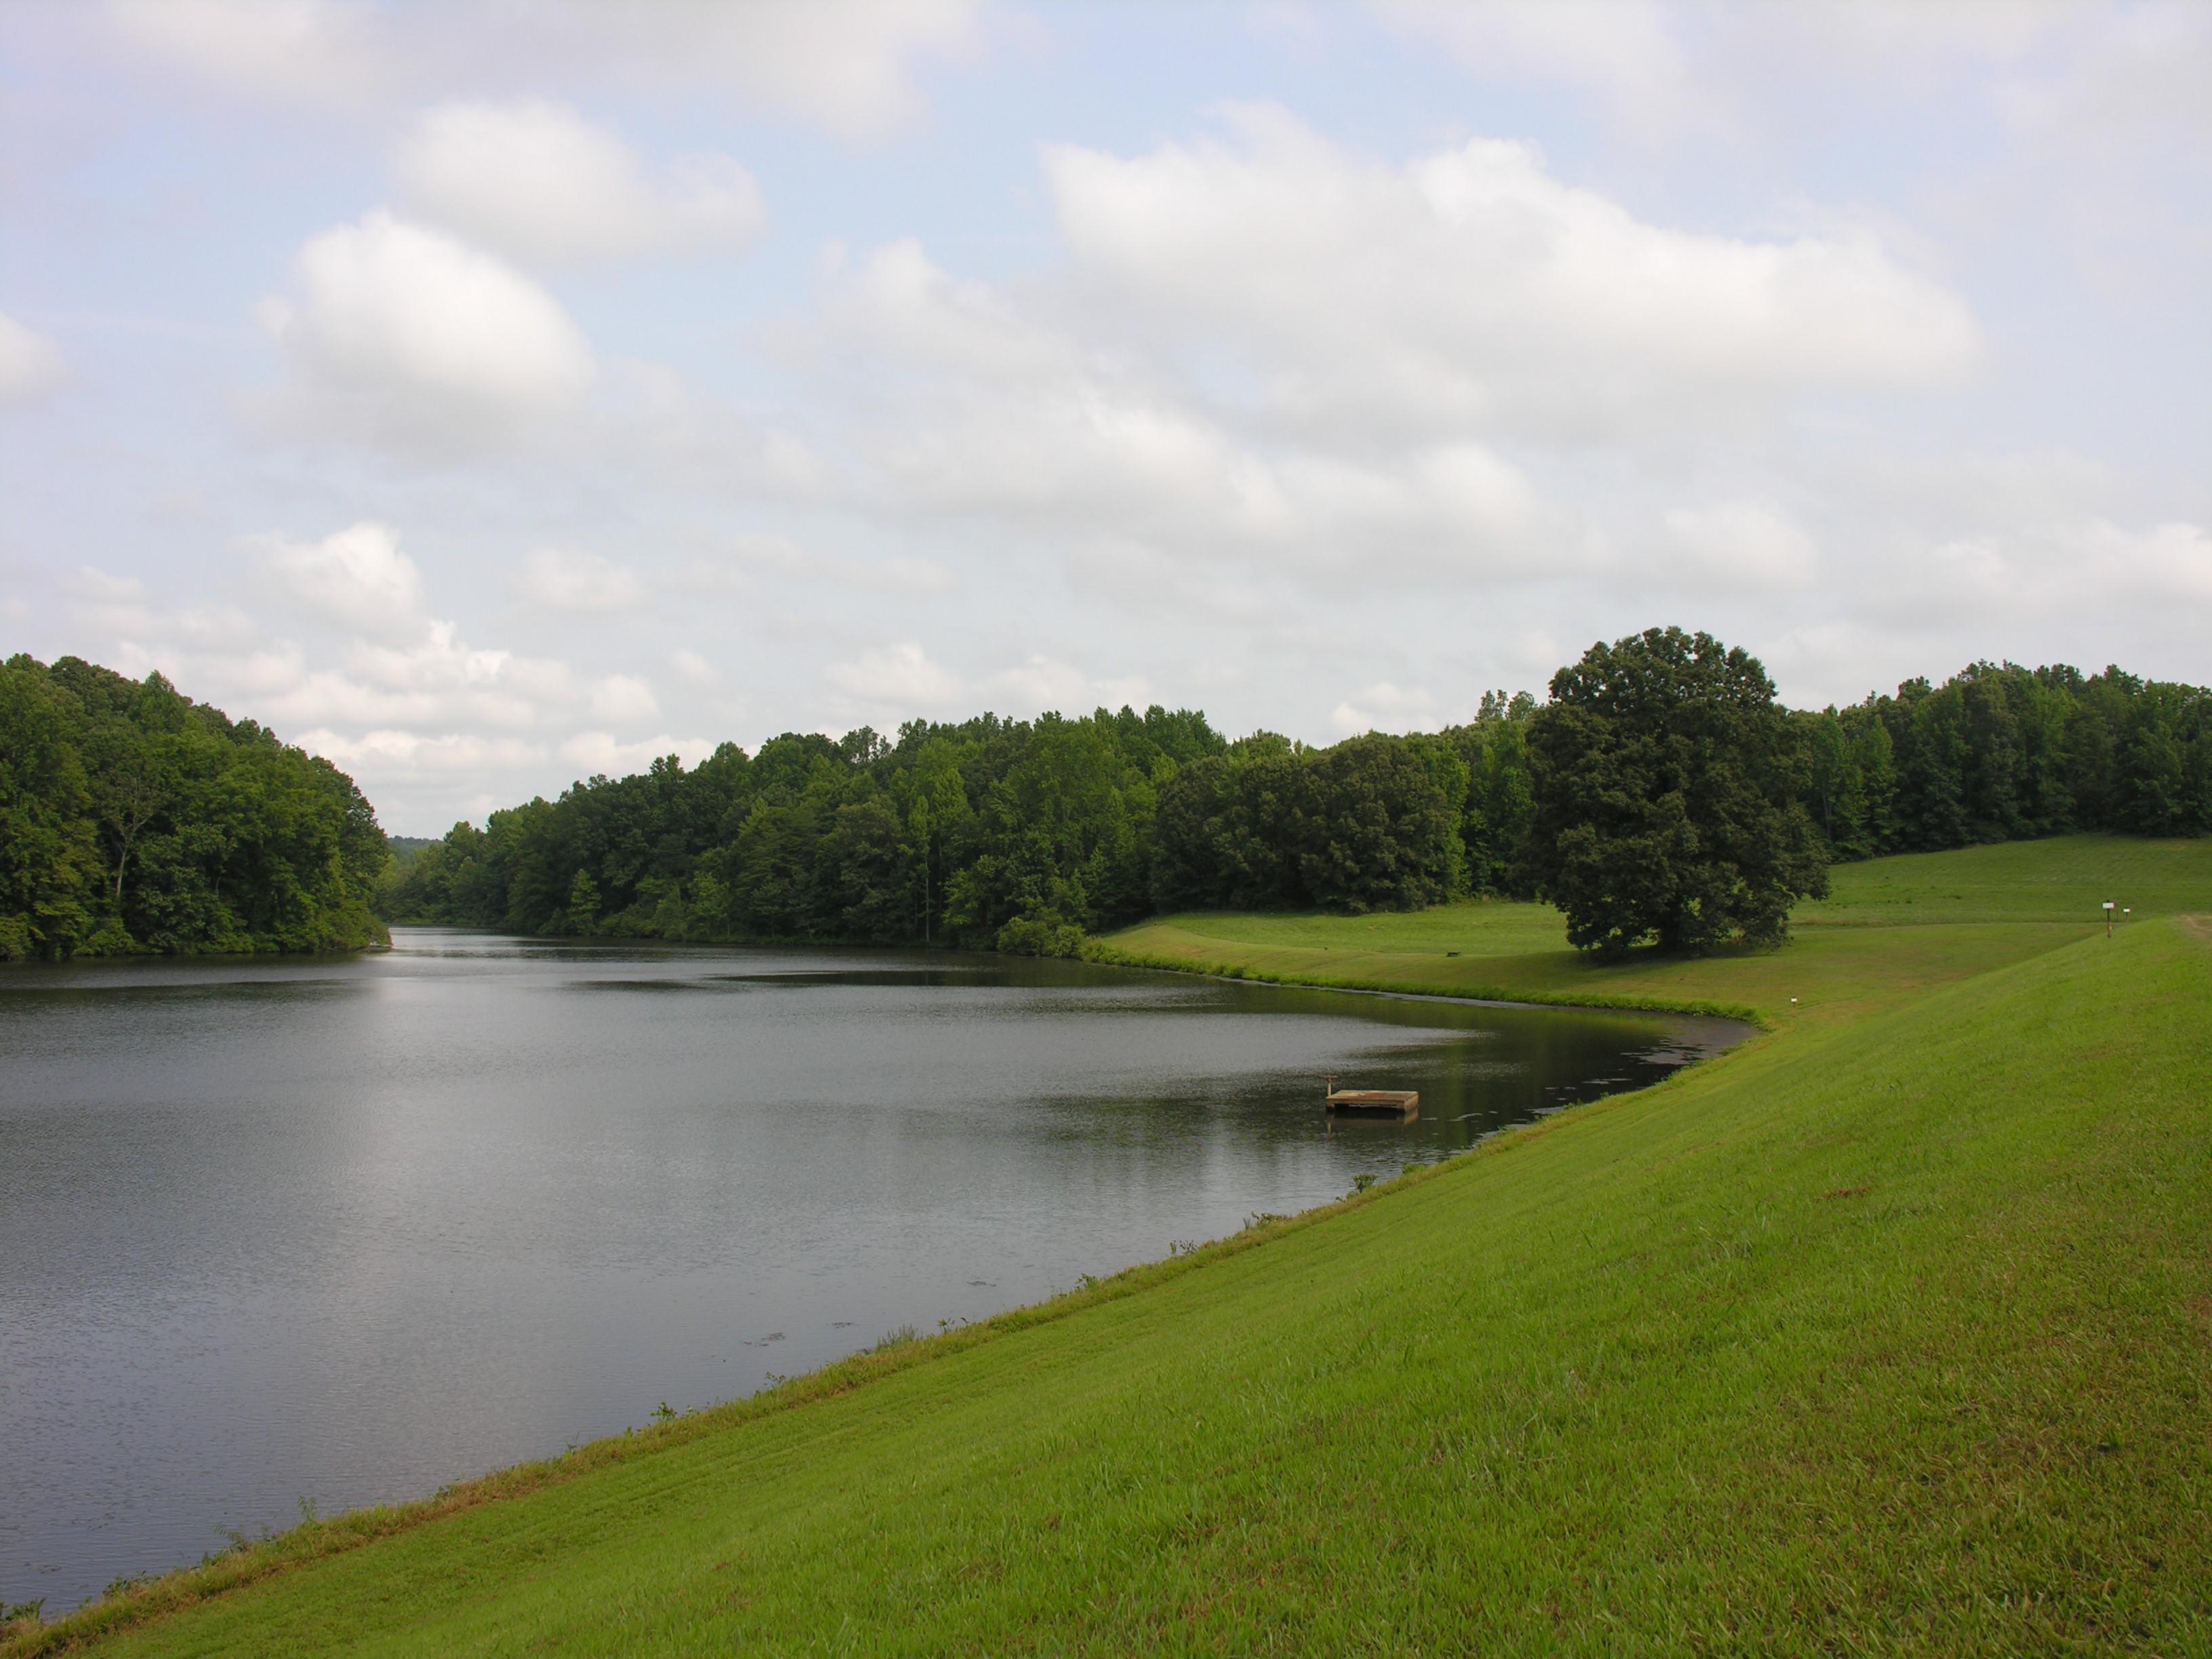 Waterfront Property in Prince Edward County, Stockton Lake, Lot 16